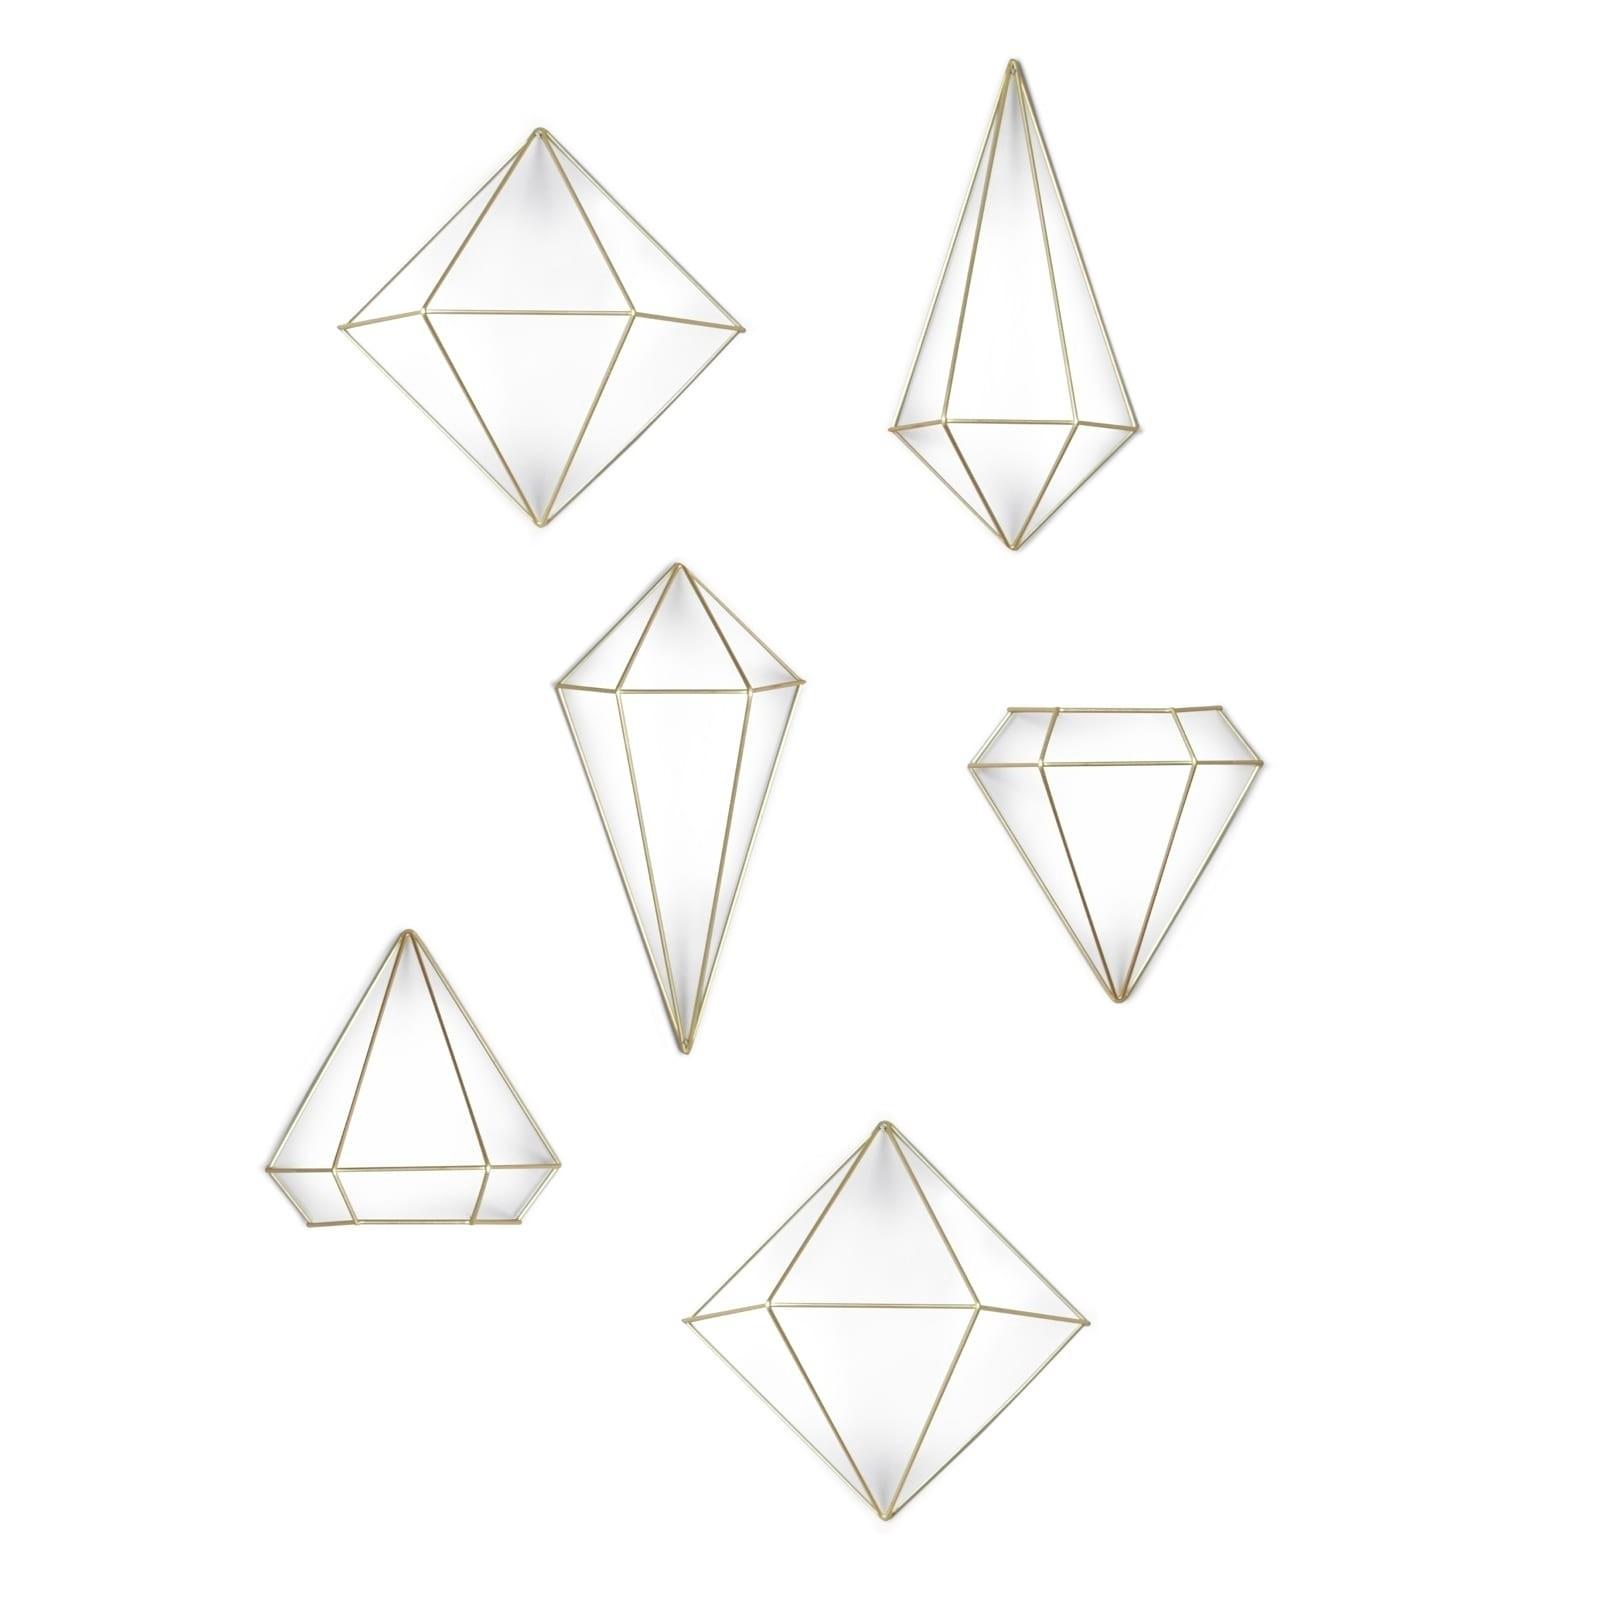 Prisma Wall Decor Set of 6 (Brass) - Umbra